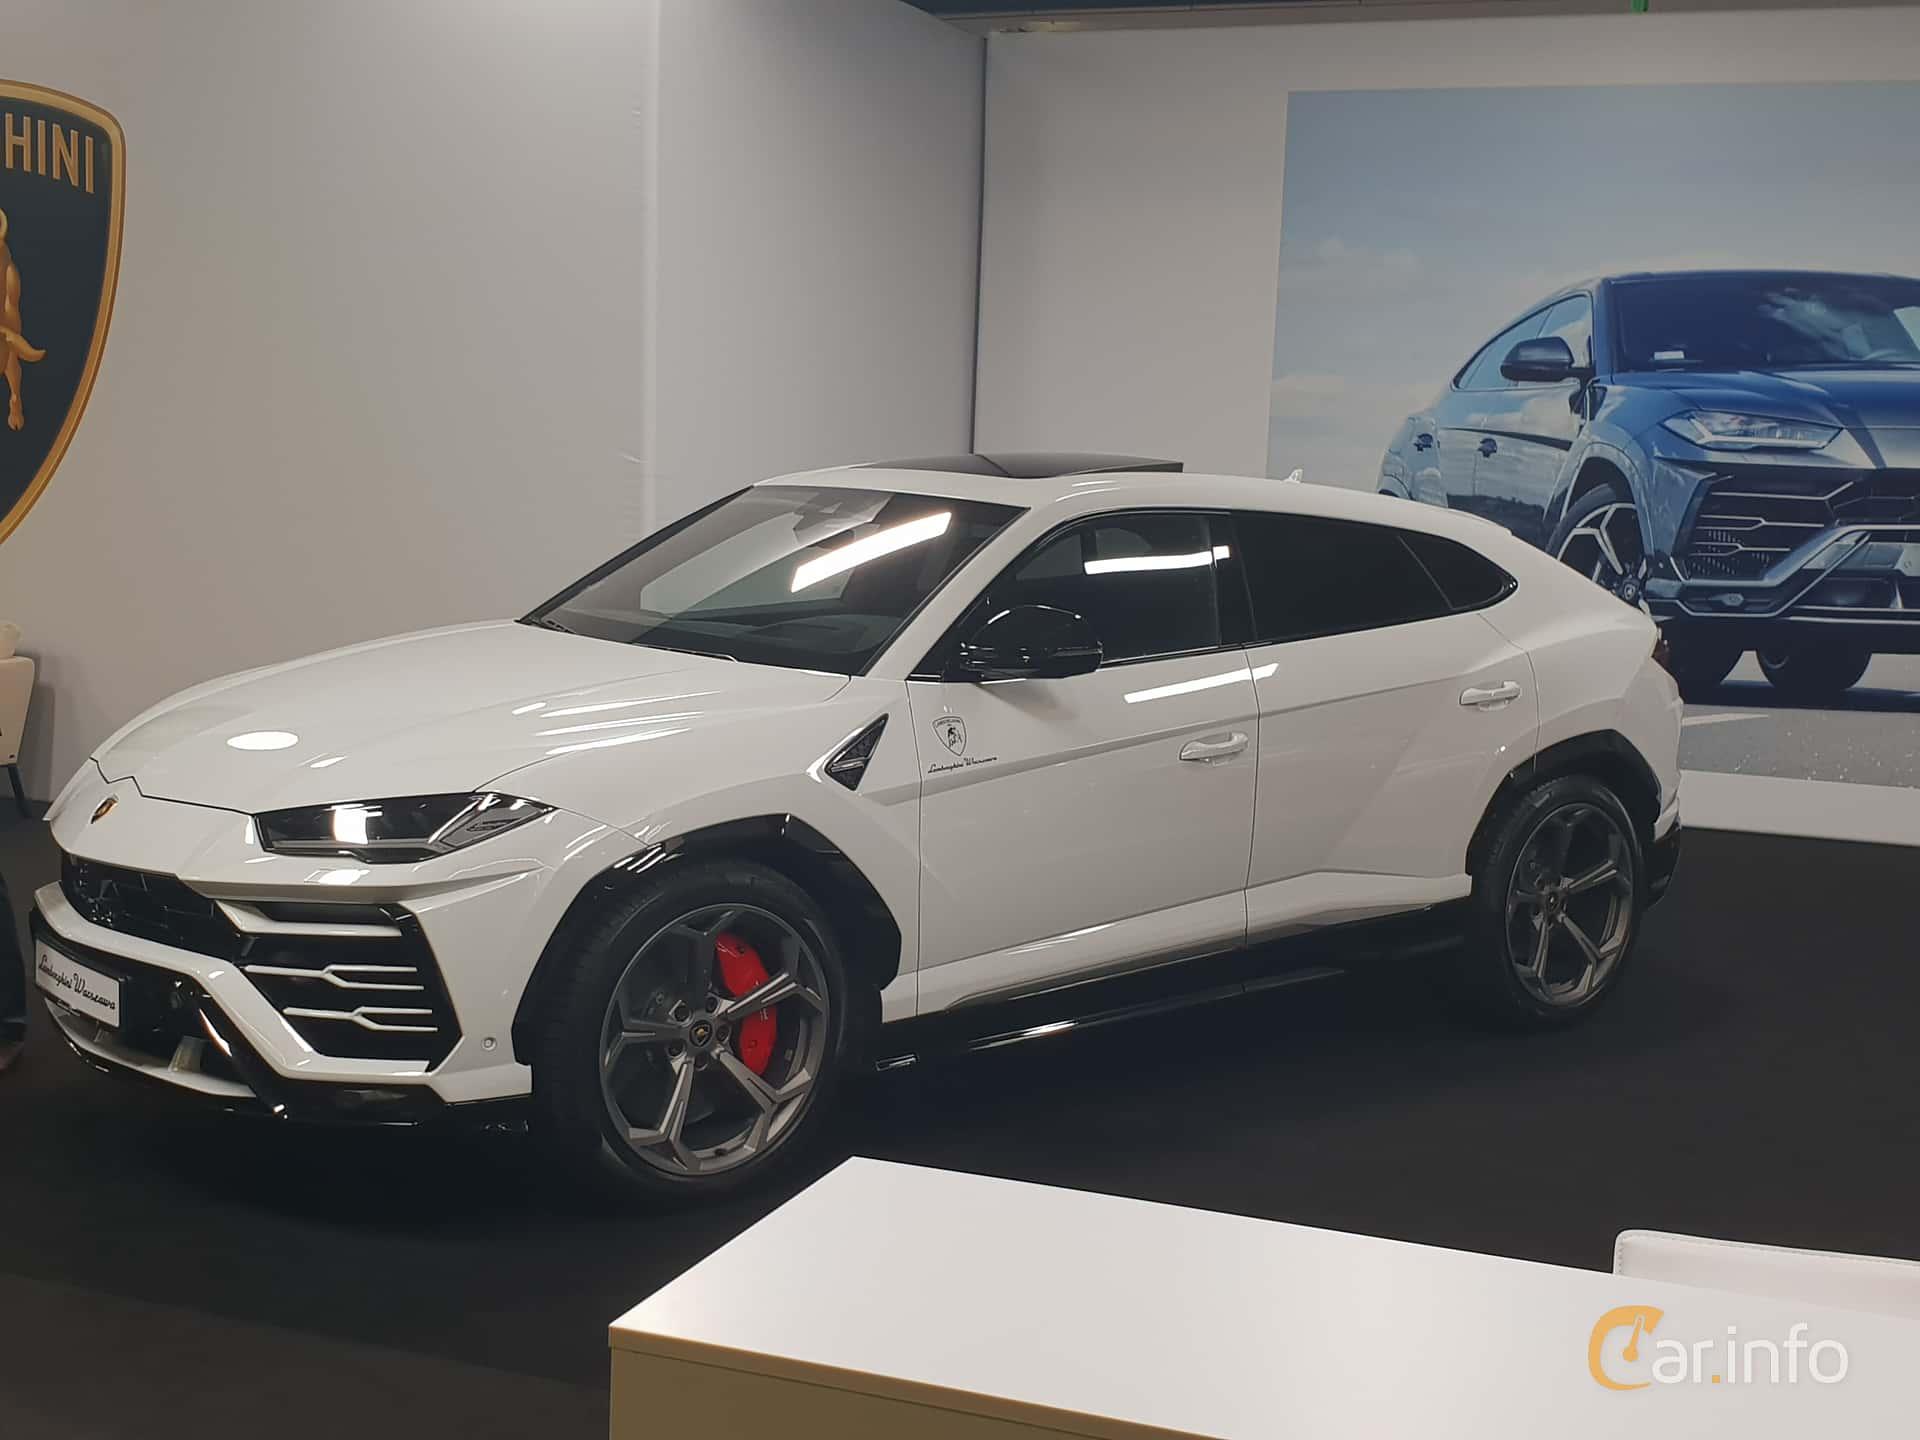 Front/Side  of Lamborghini Urus 4.0 V8 AWD Automatic, 650ps, 2018 at Warsawa Motorshow 2018